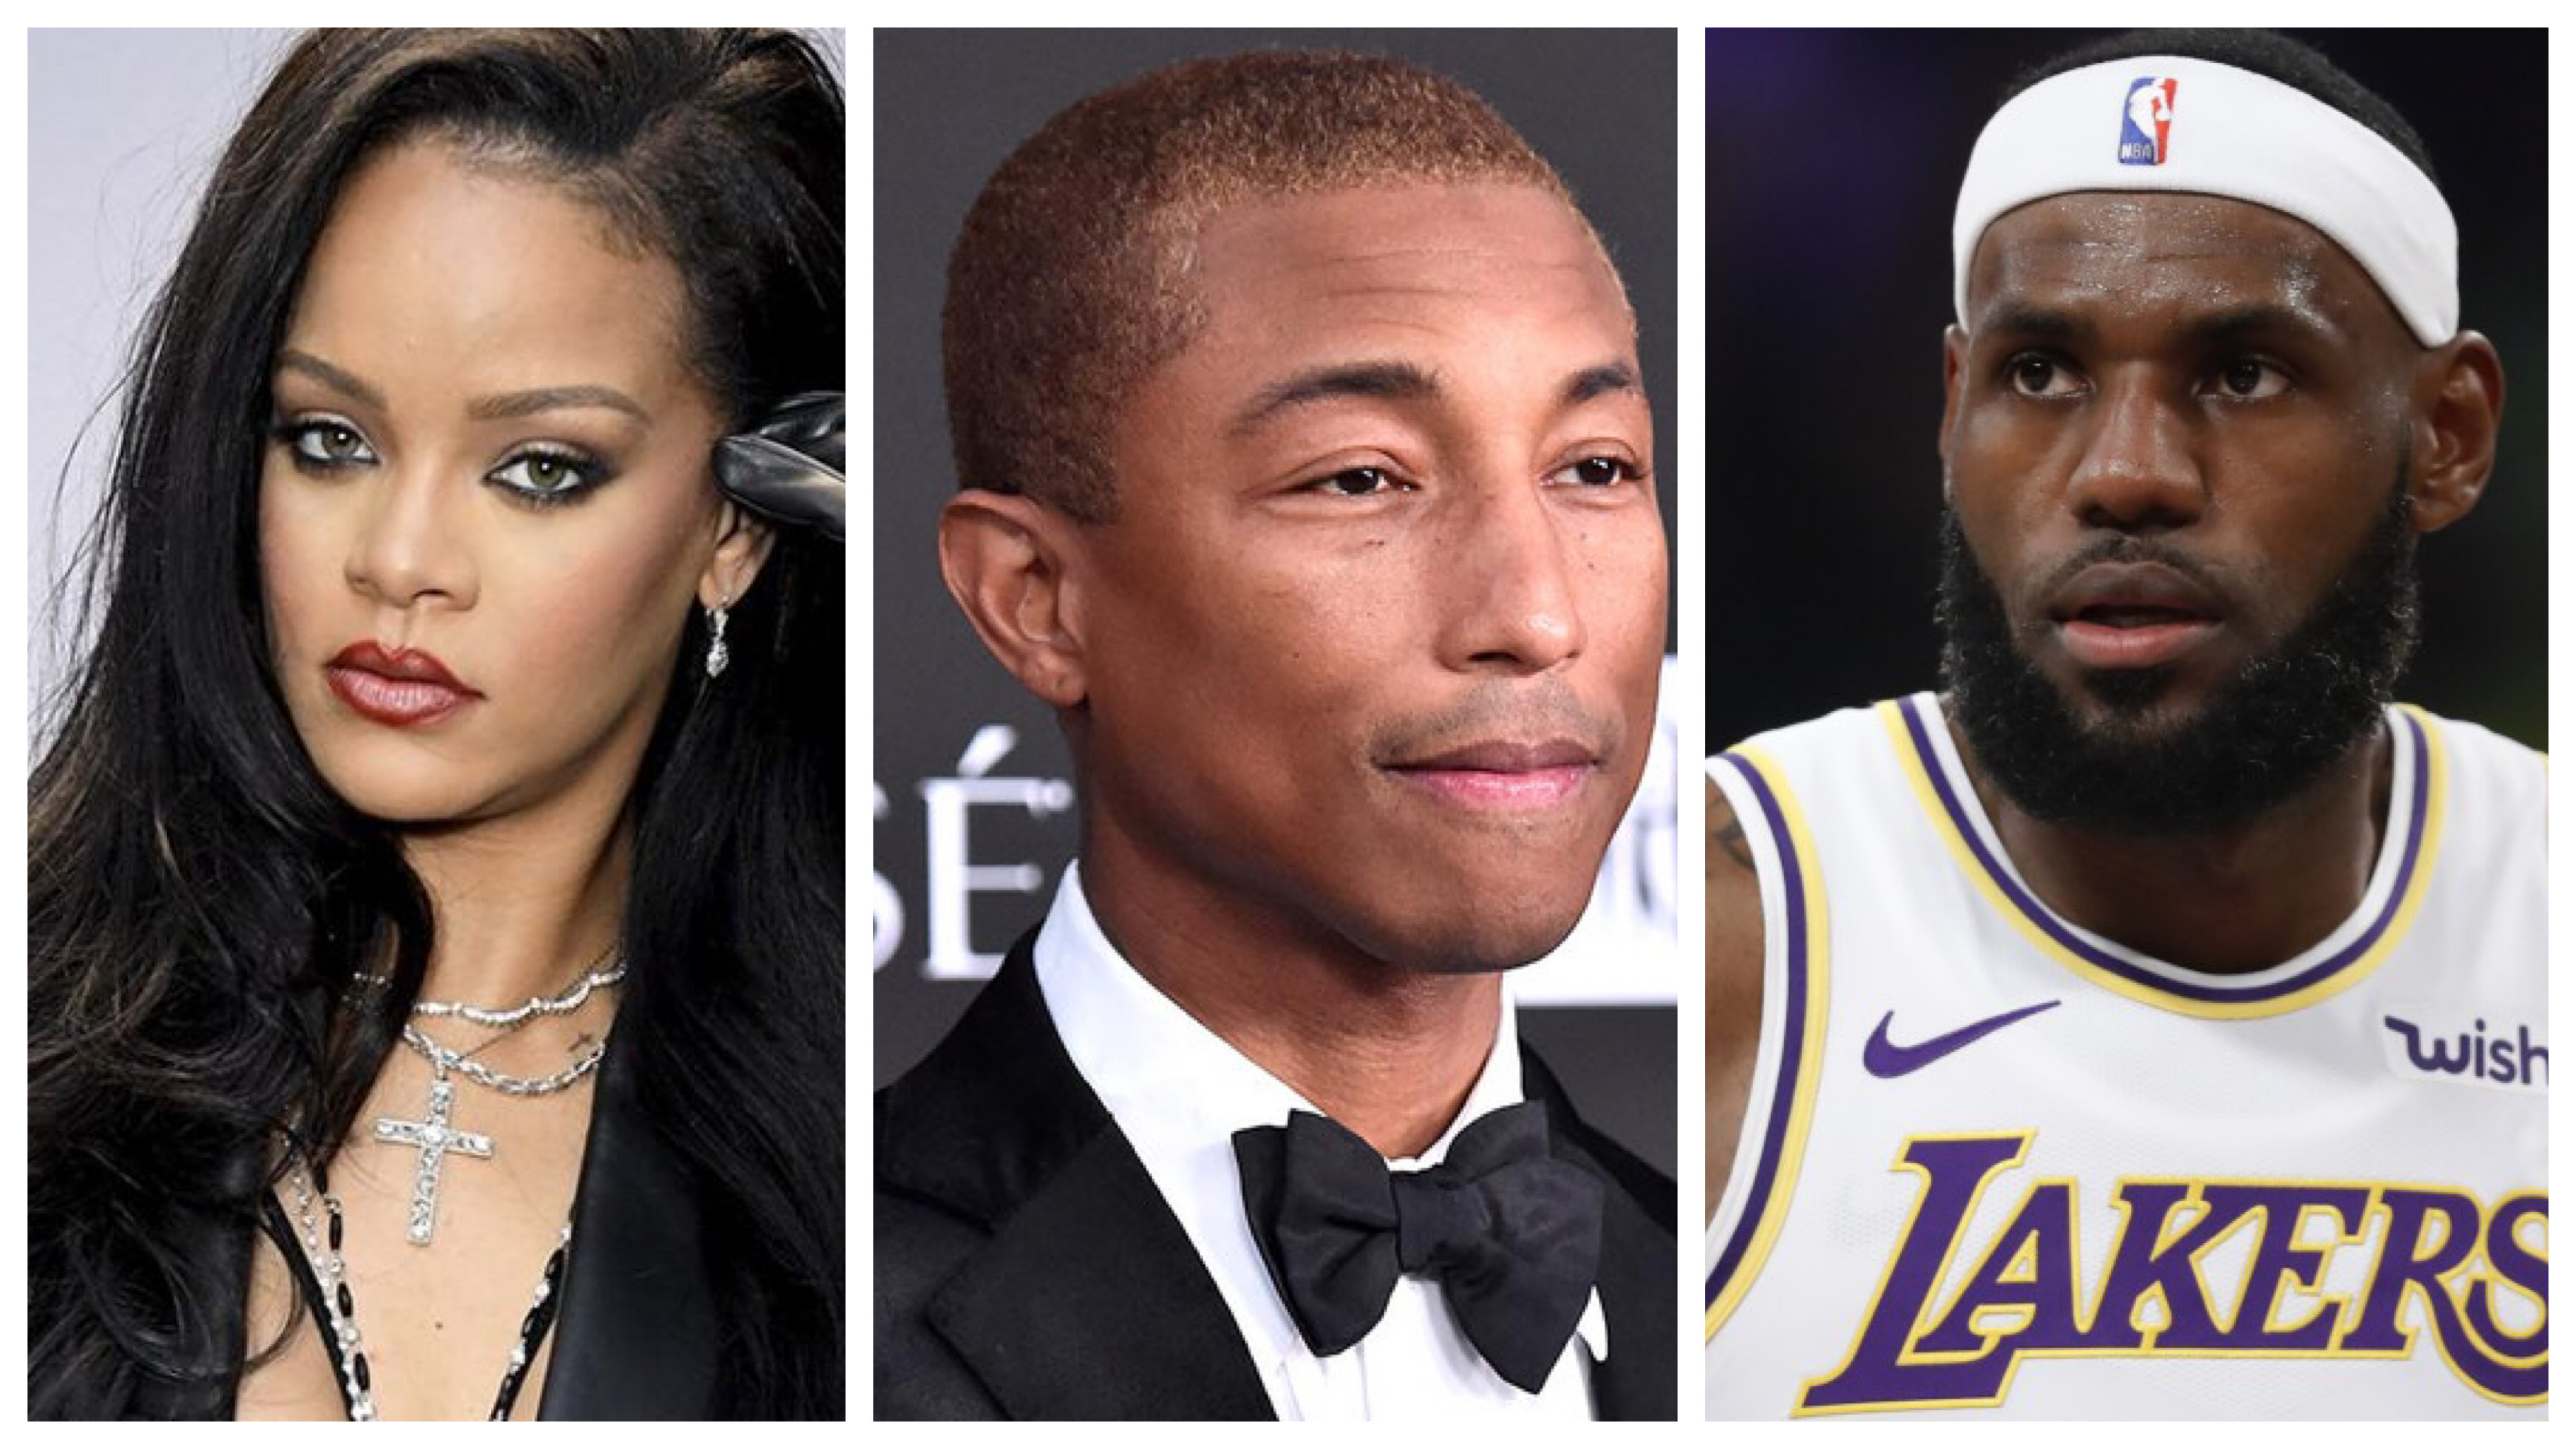 Rihanna, Pharrell and LeBron James